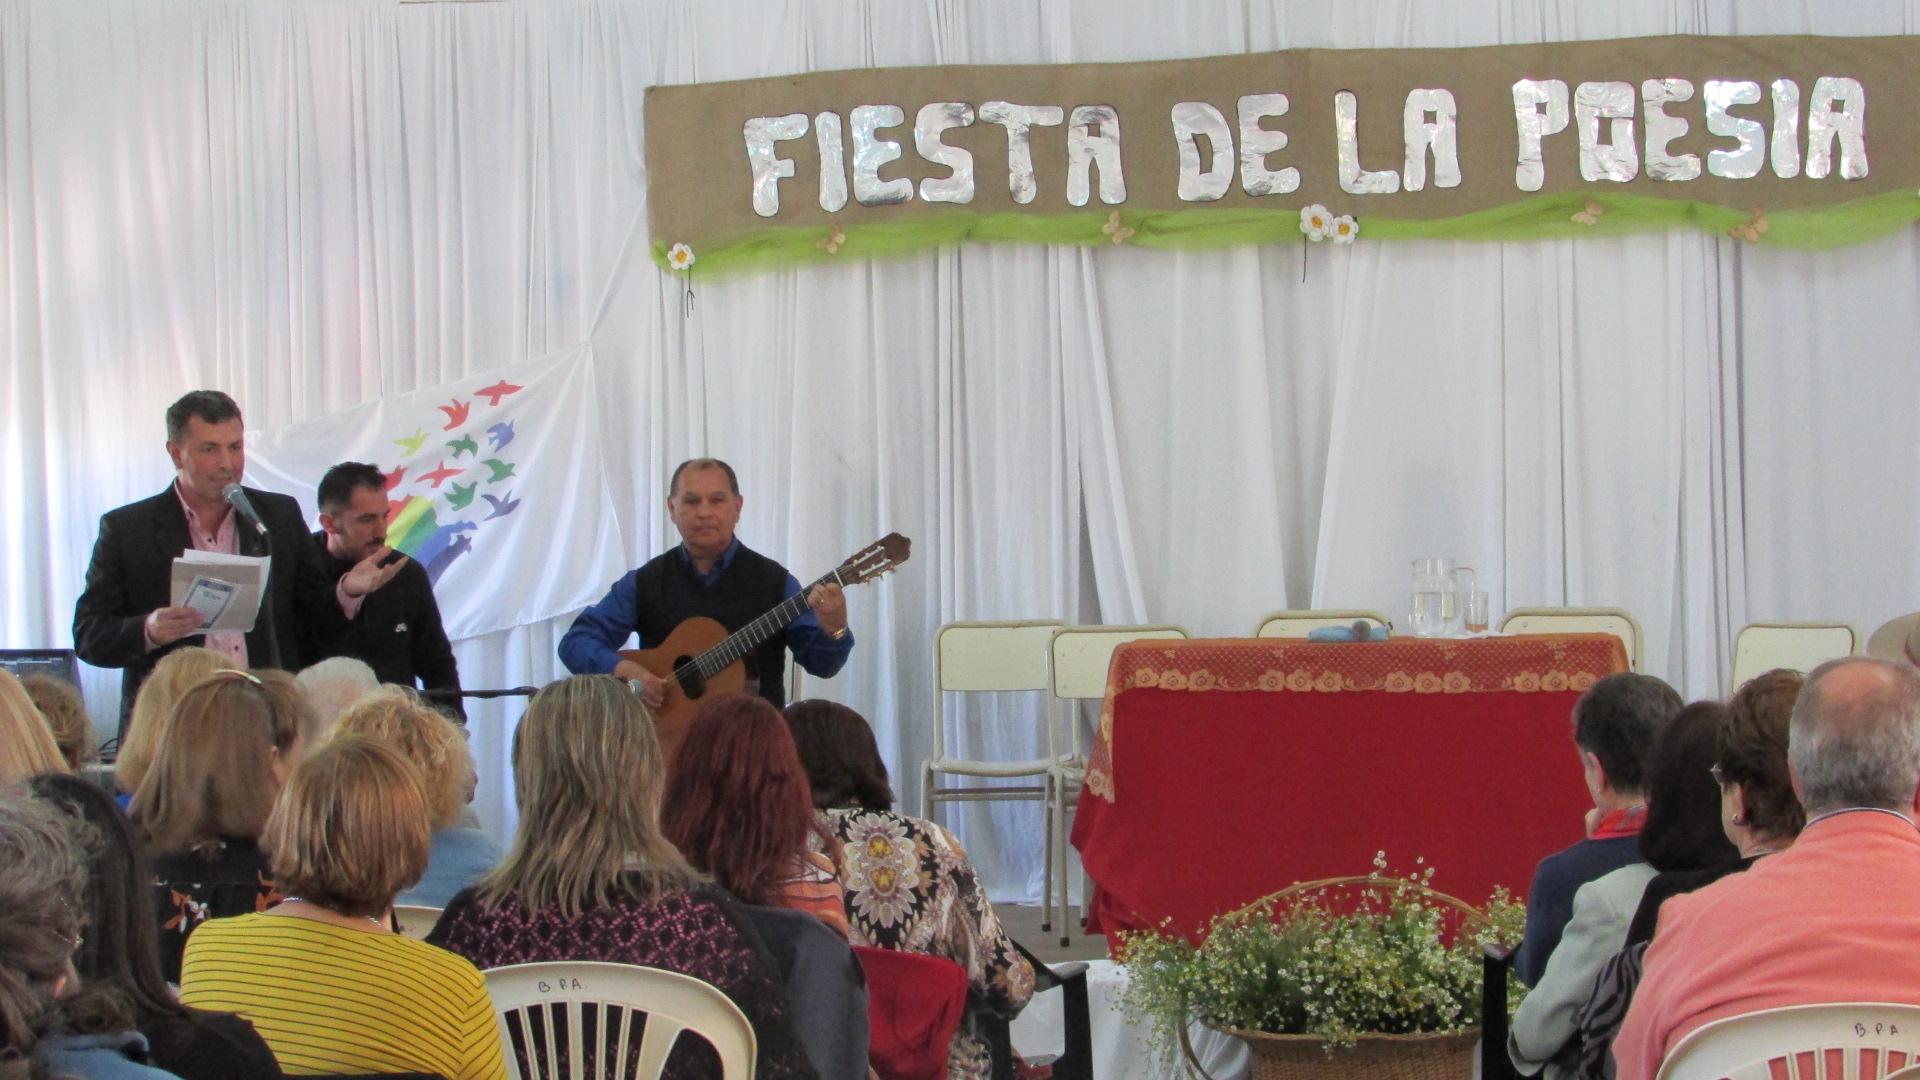 Anibal Alberto Fernández